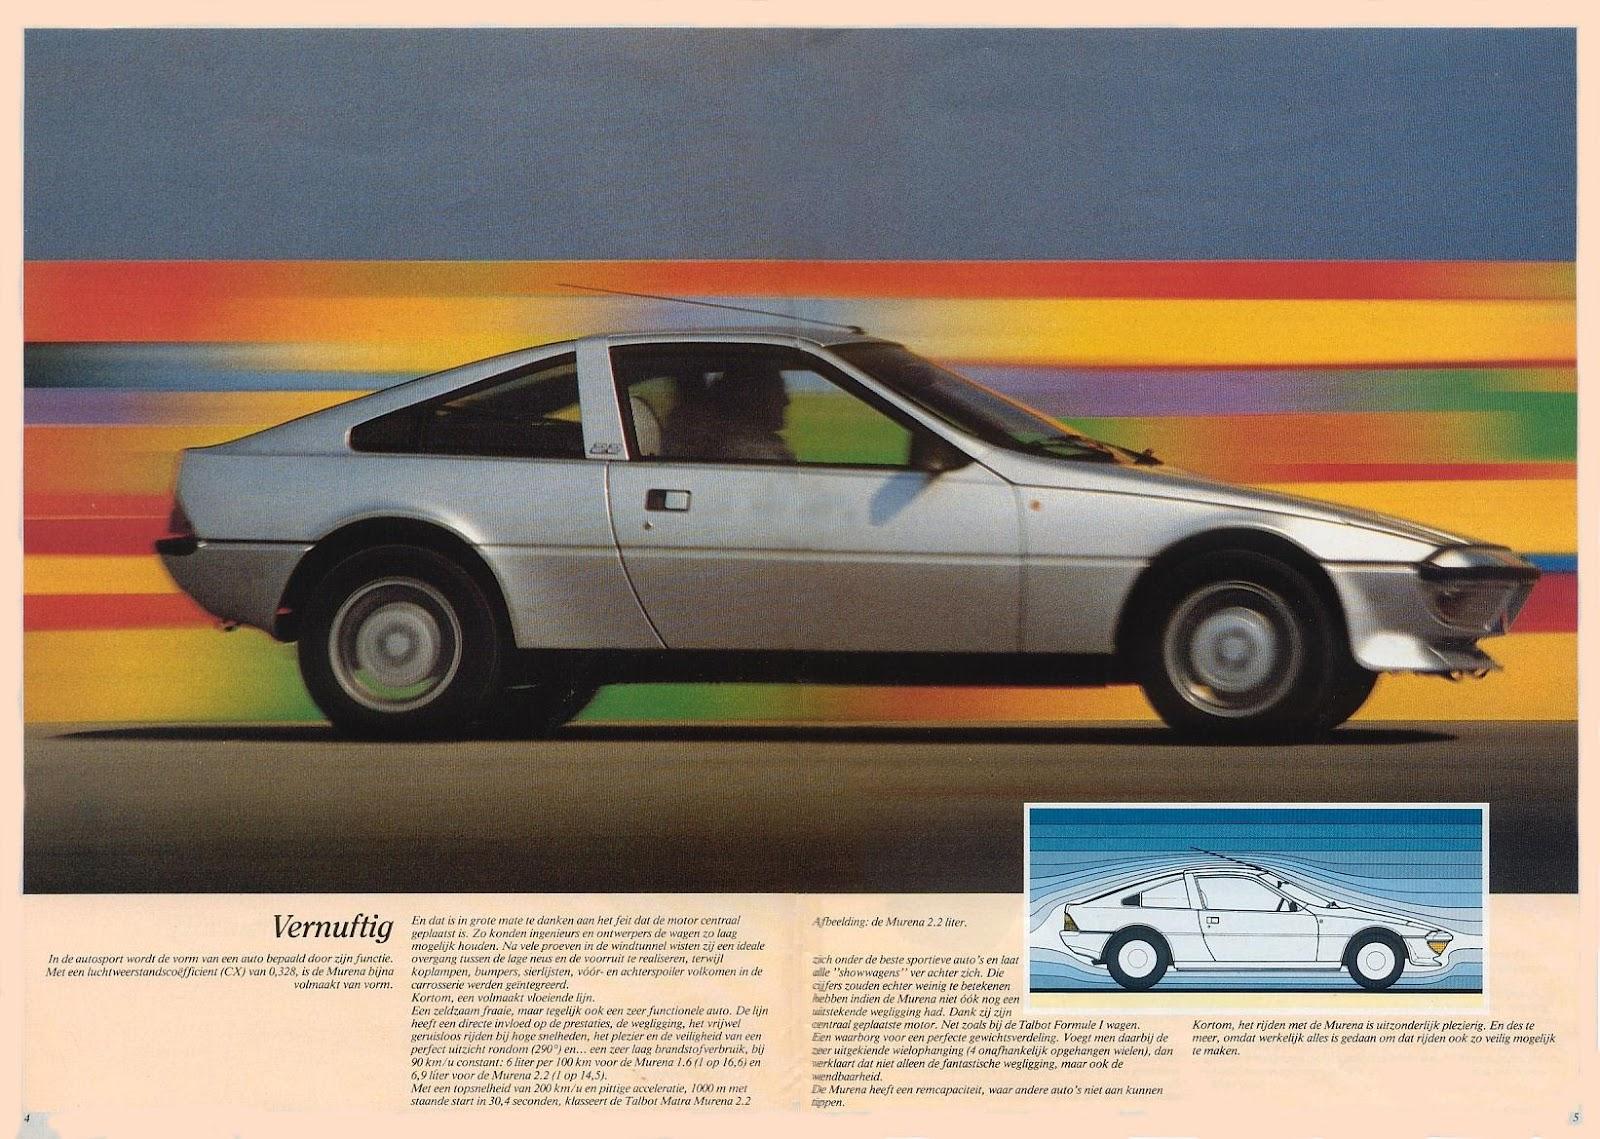 1983-Talbot-Matra-Murena-03.jpg